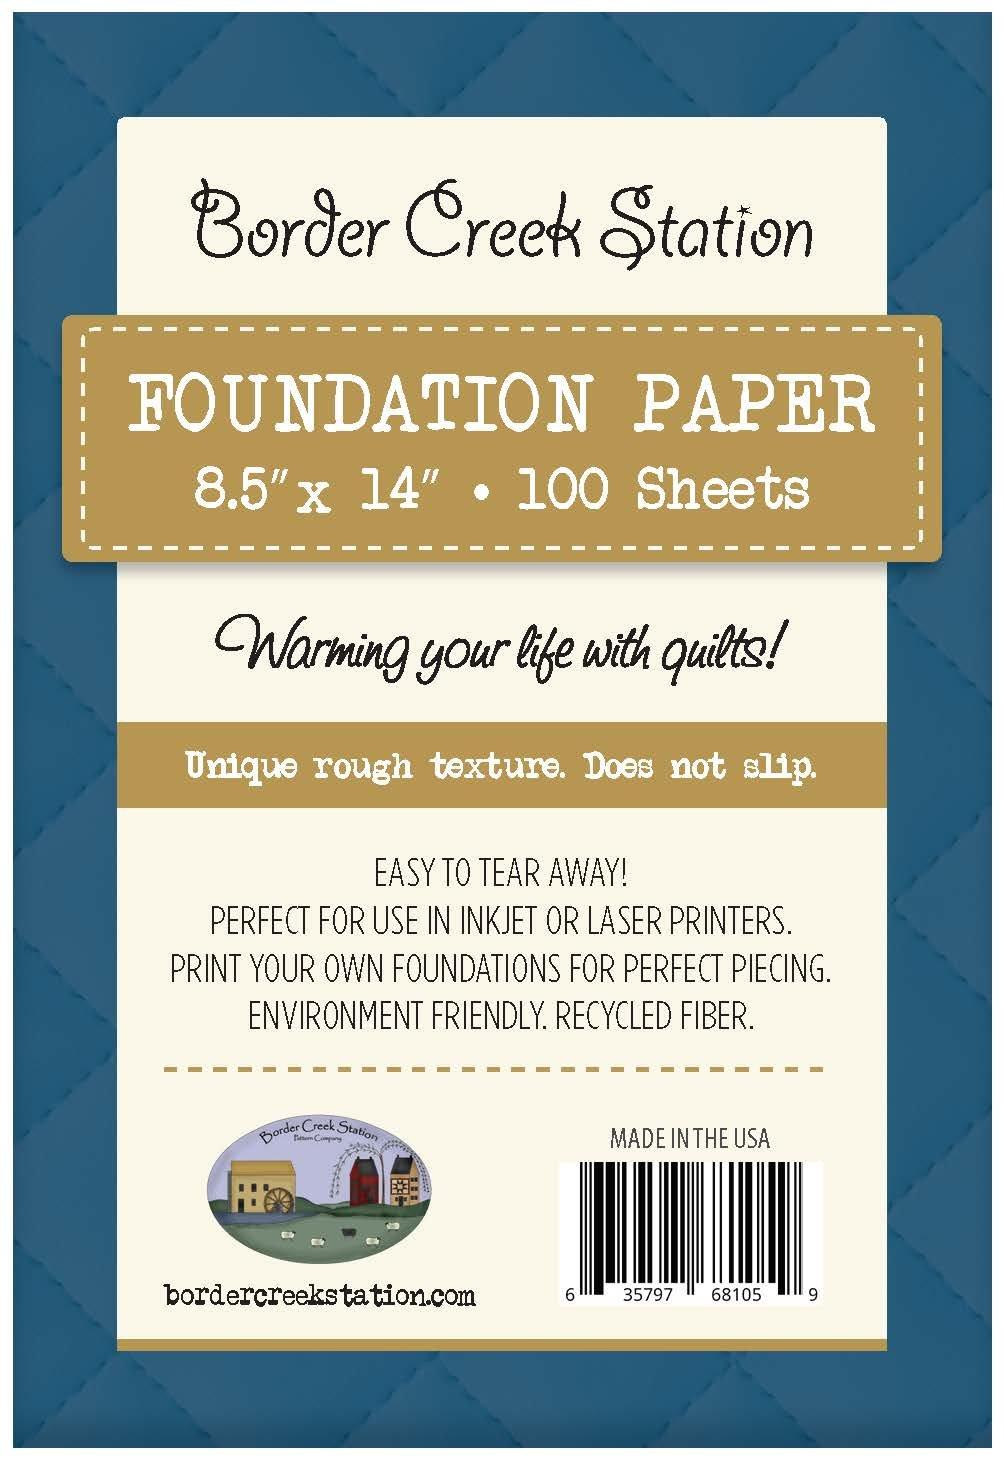 BCS Foundation Paper - 100 sheet pkg. 8.5 x 14